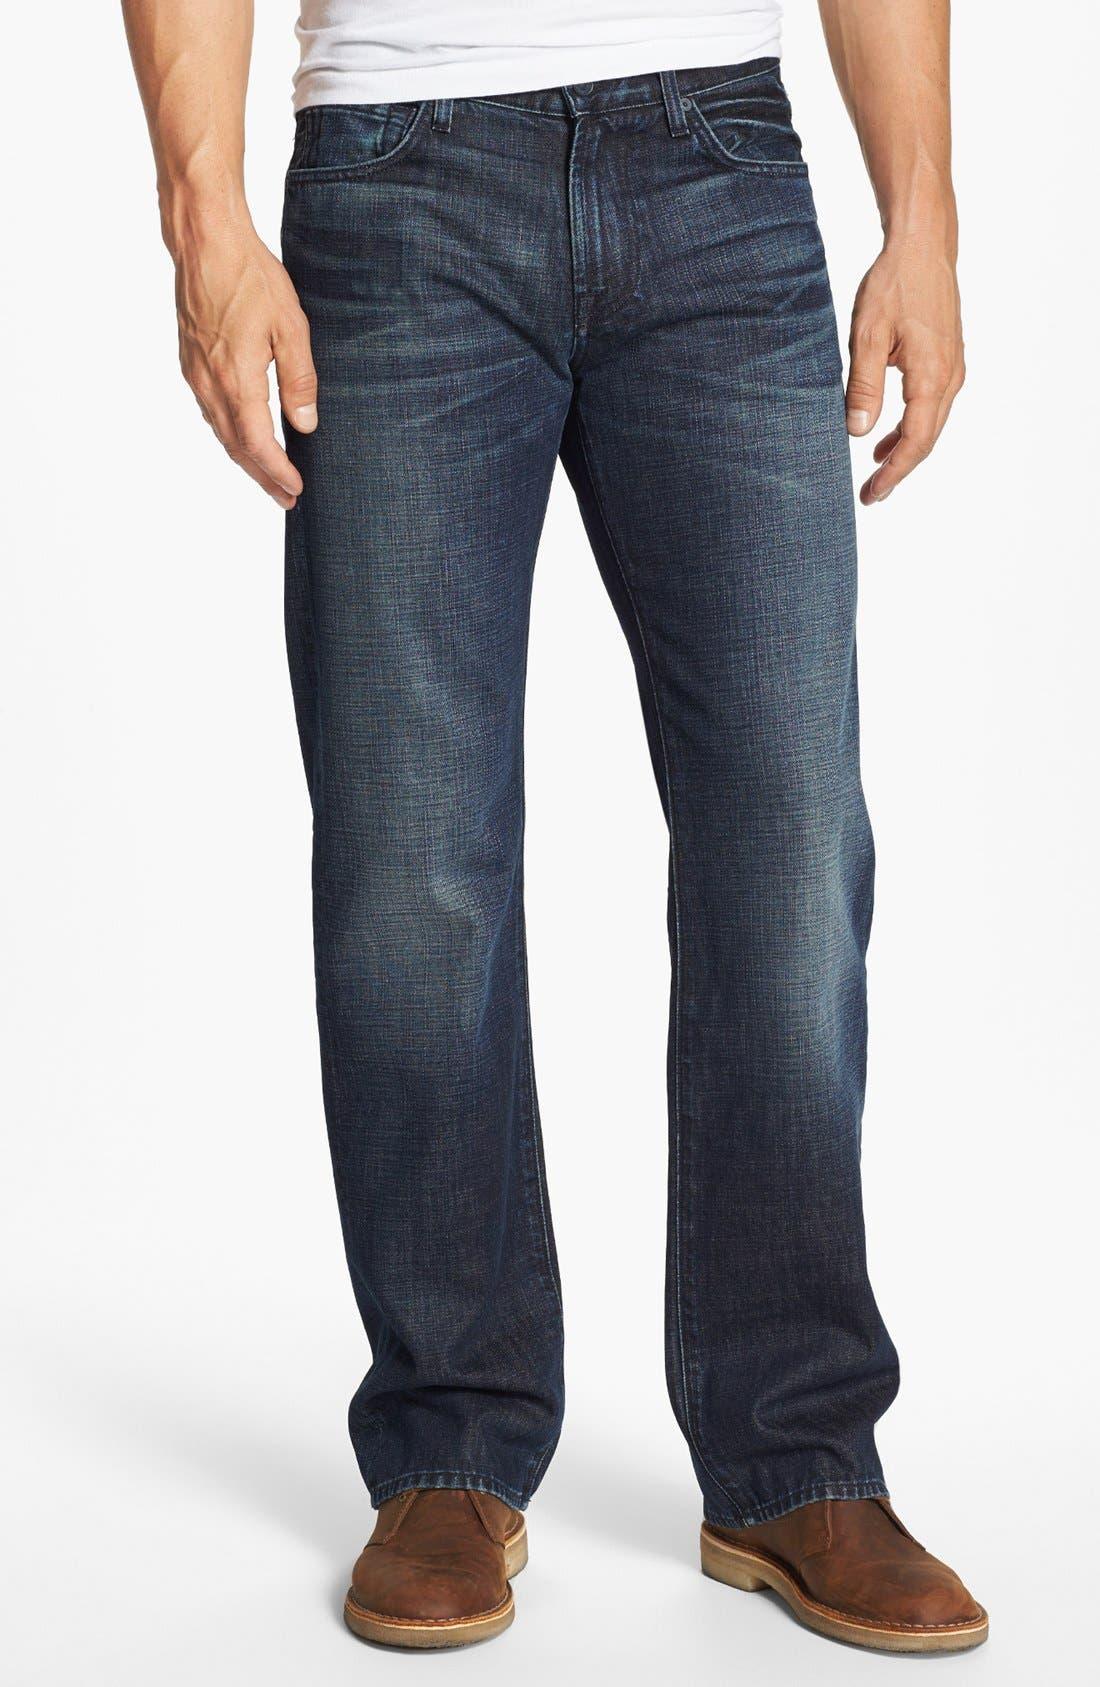 Alternate Image 2  - 7 For All Mankind® 'Austyn' Straight Leg Jeans (Porter Mist)